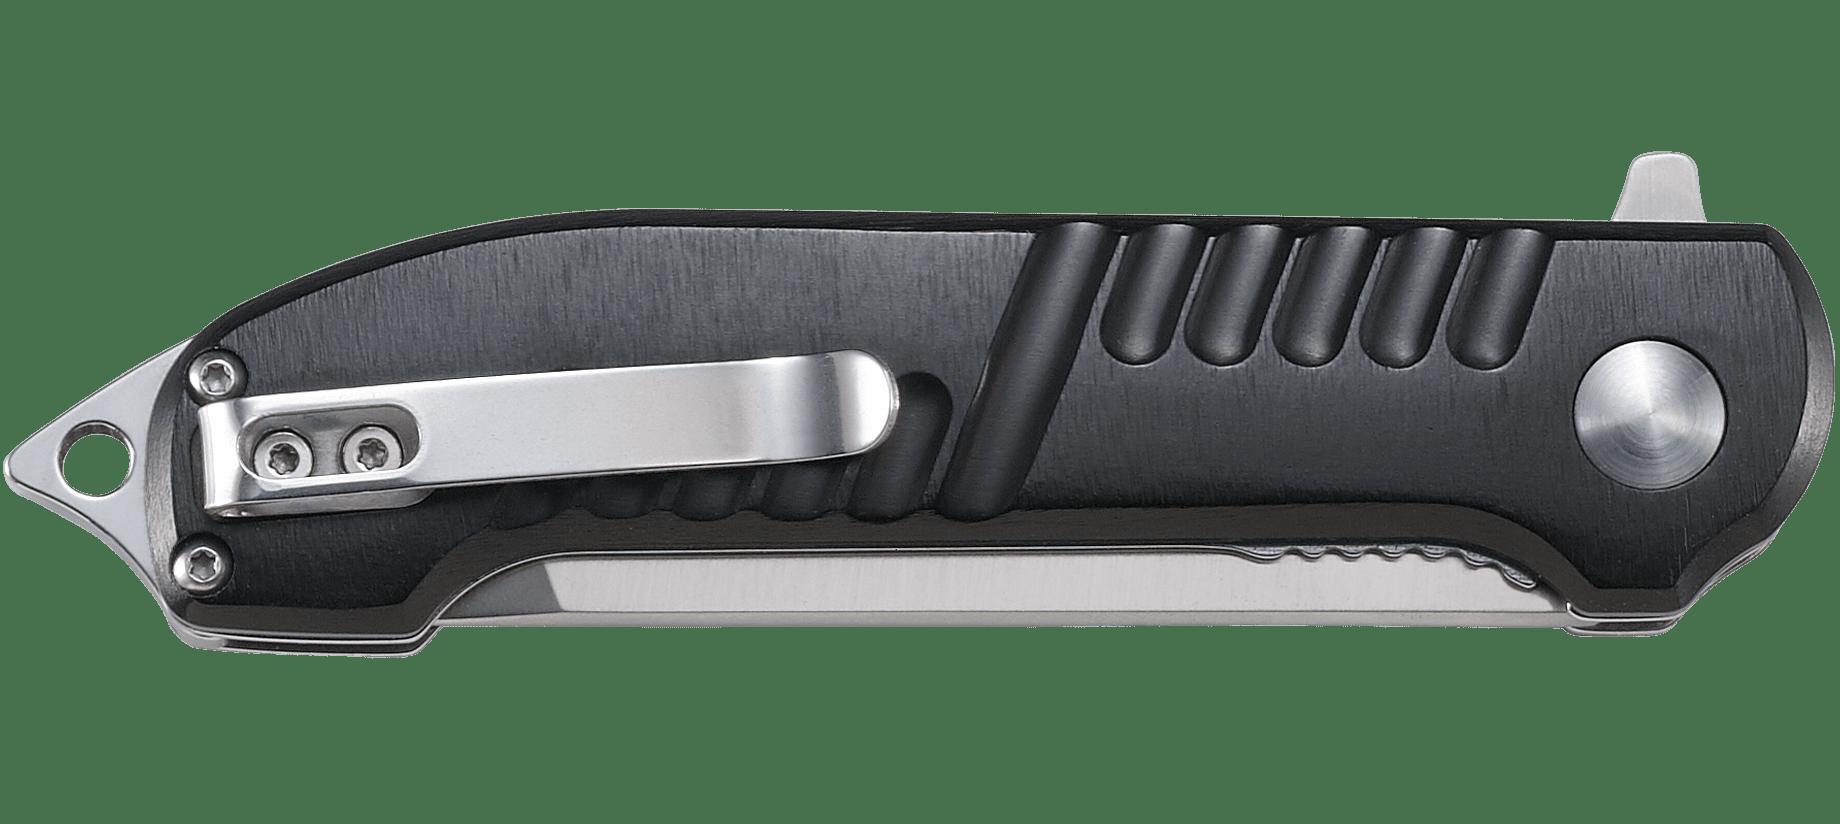 crkt knives knife razel gt folder knife edc blade